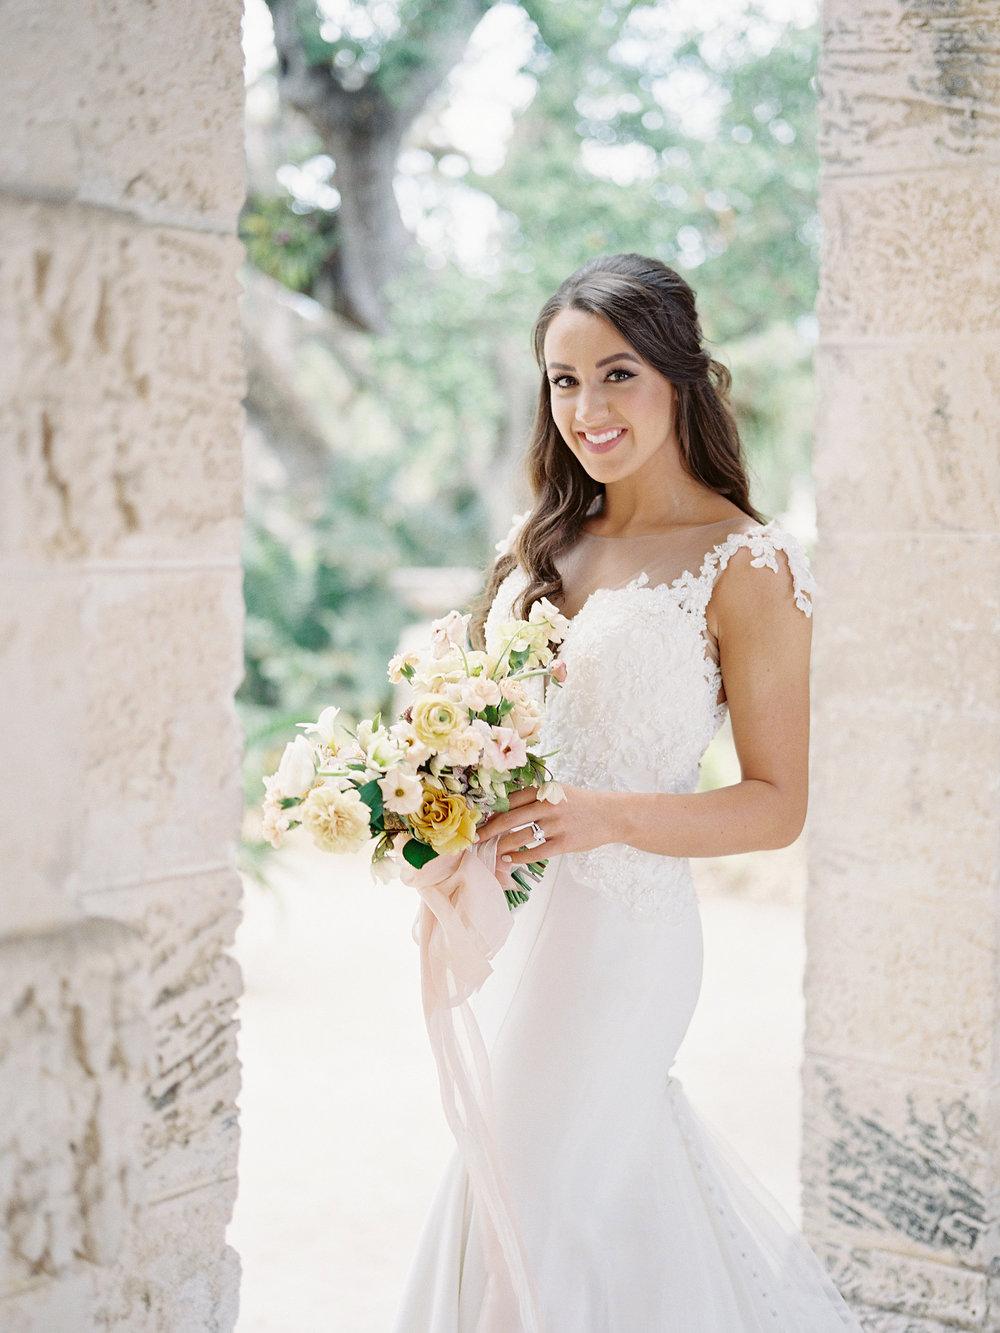 jessica-zimmerman-bridal-bouquet-miami.jpg